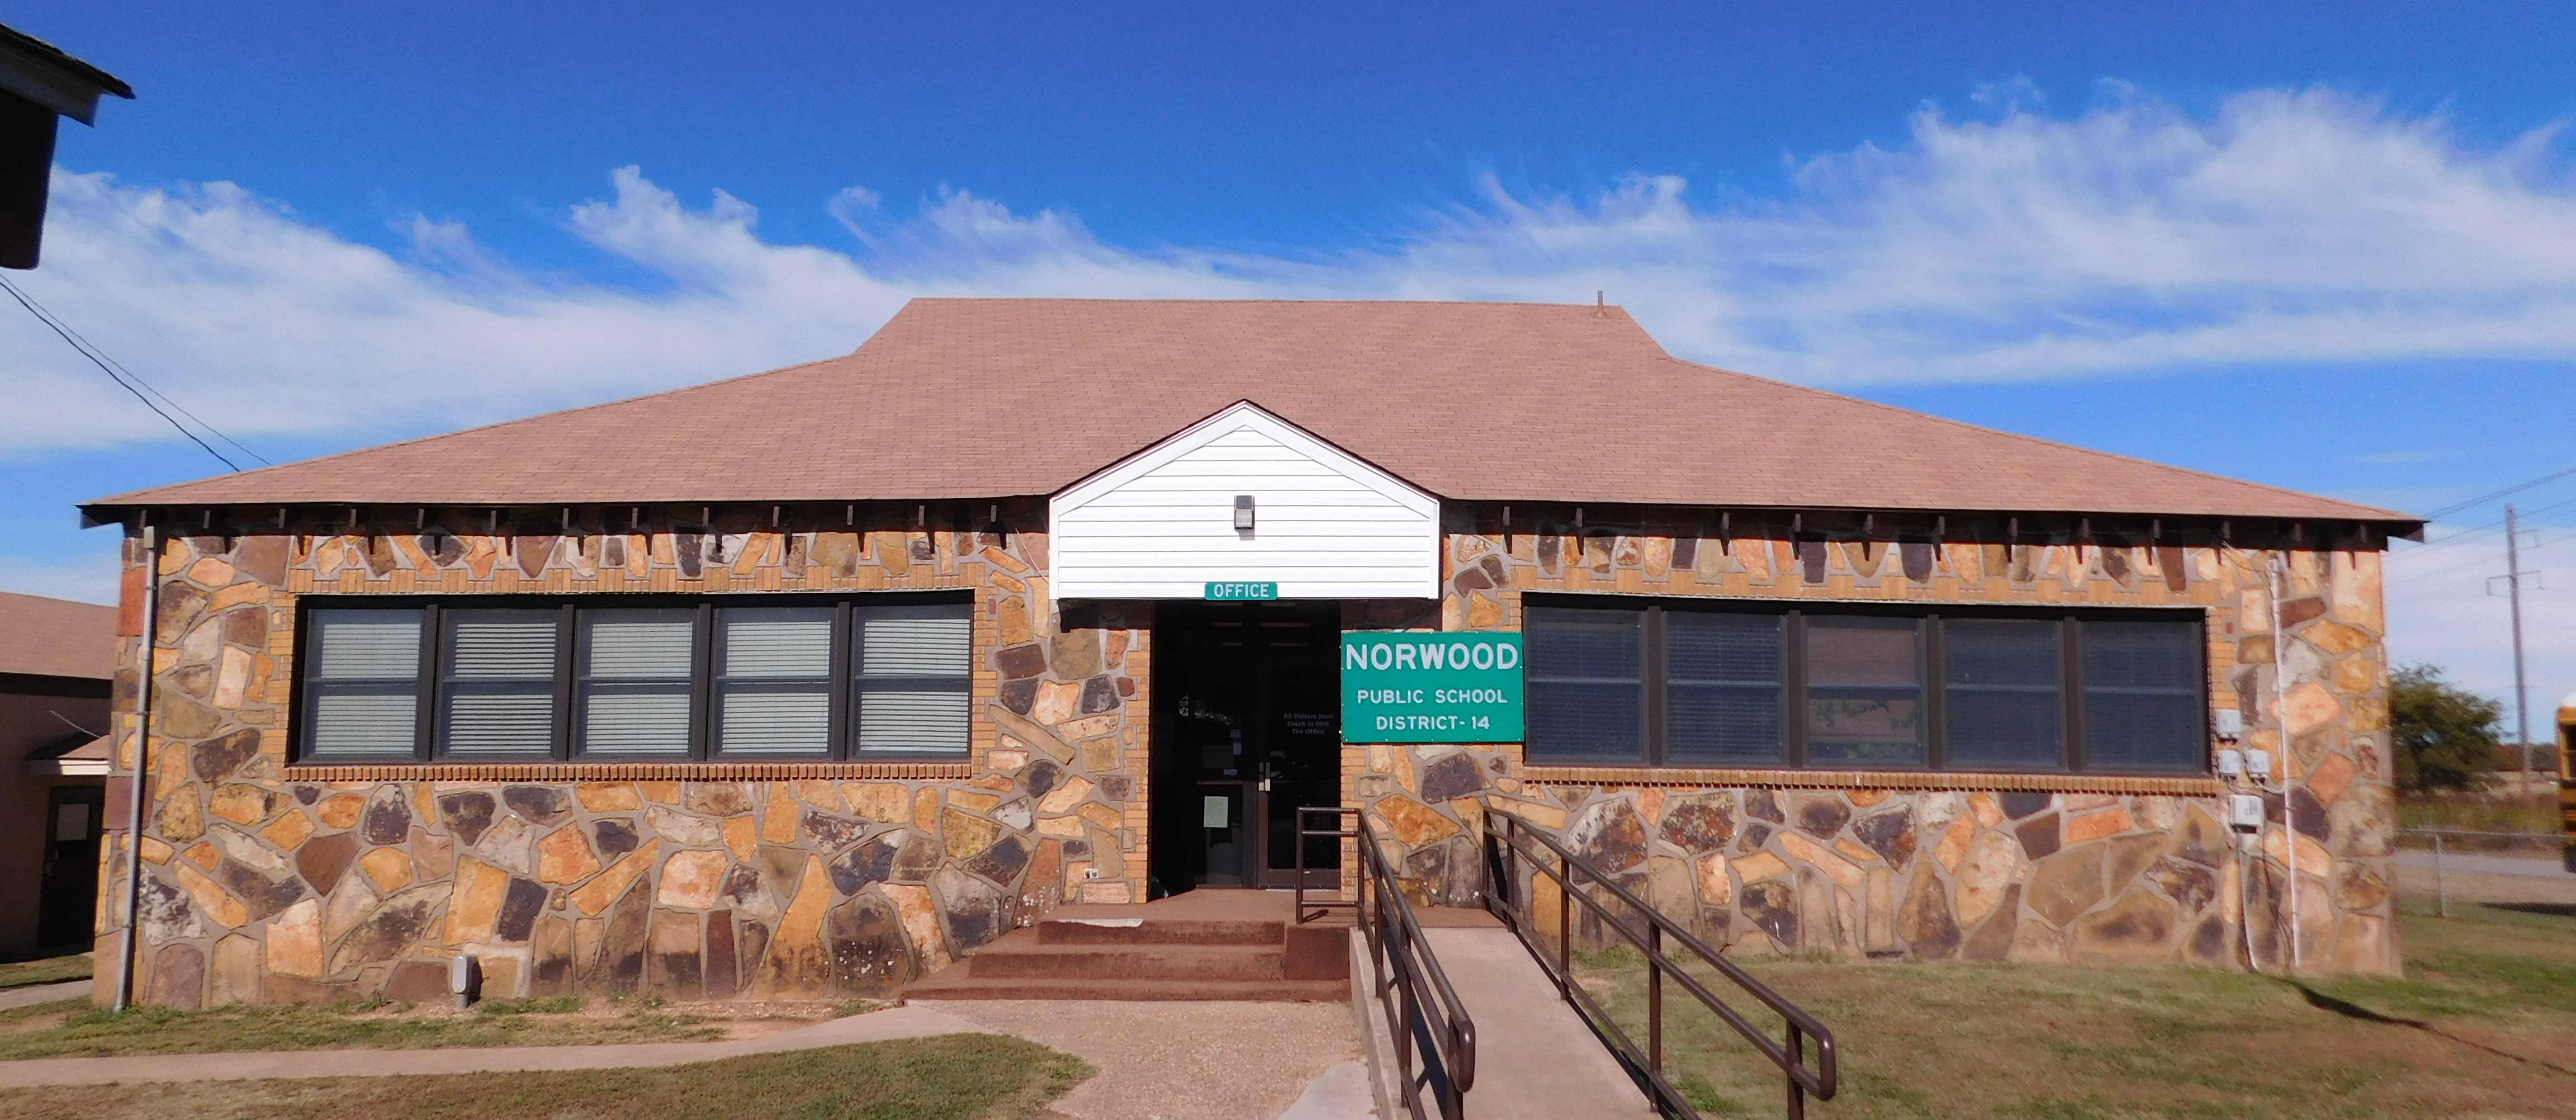 Norwood School Building